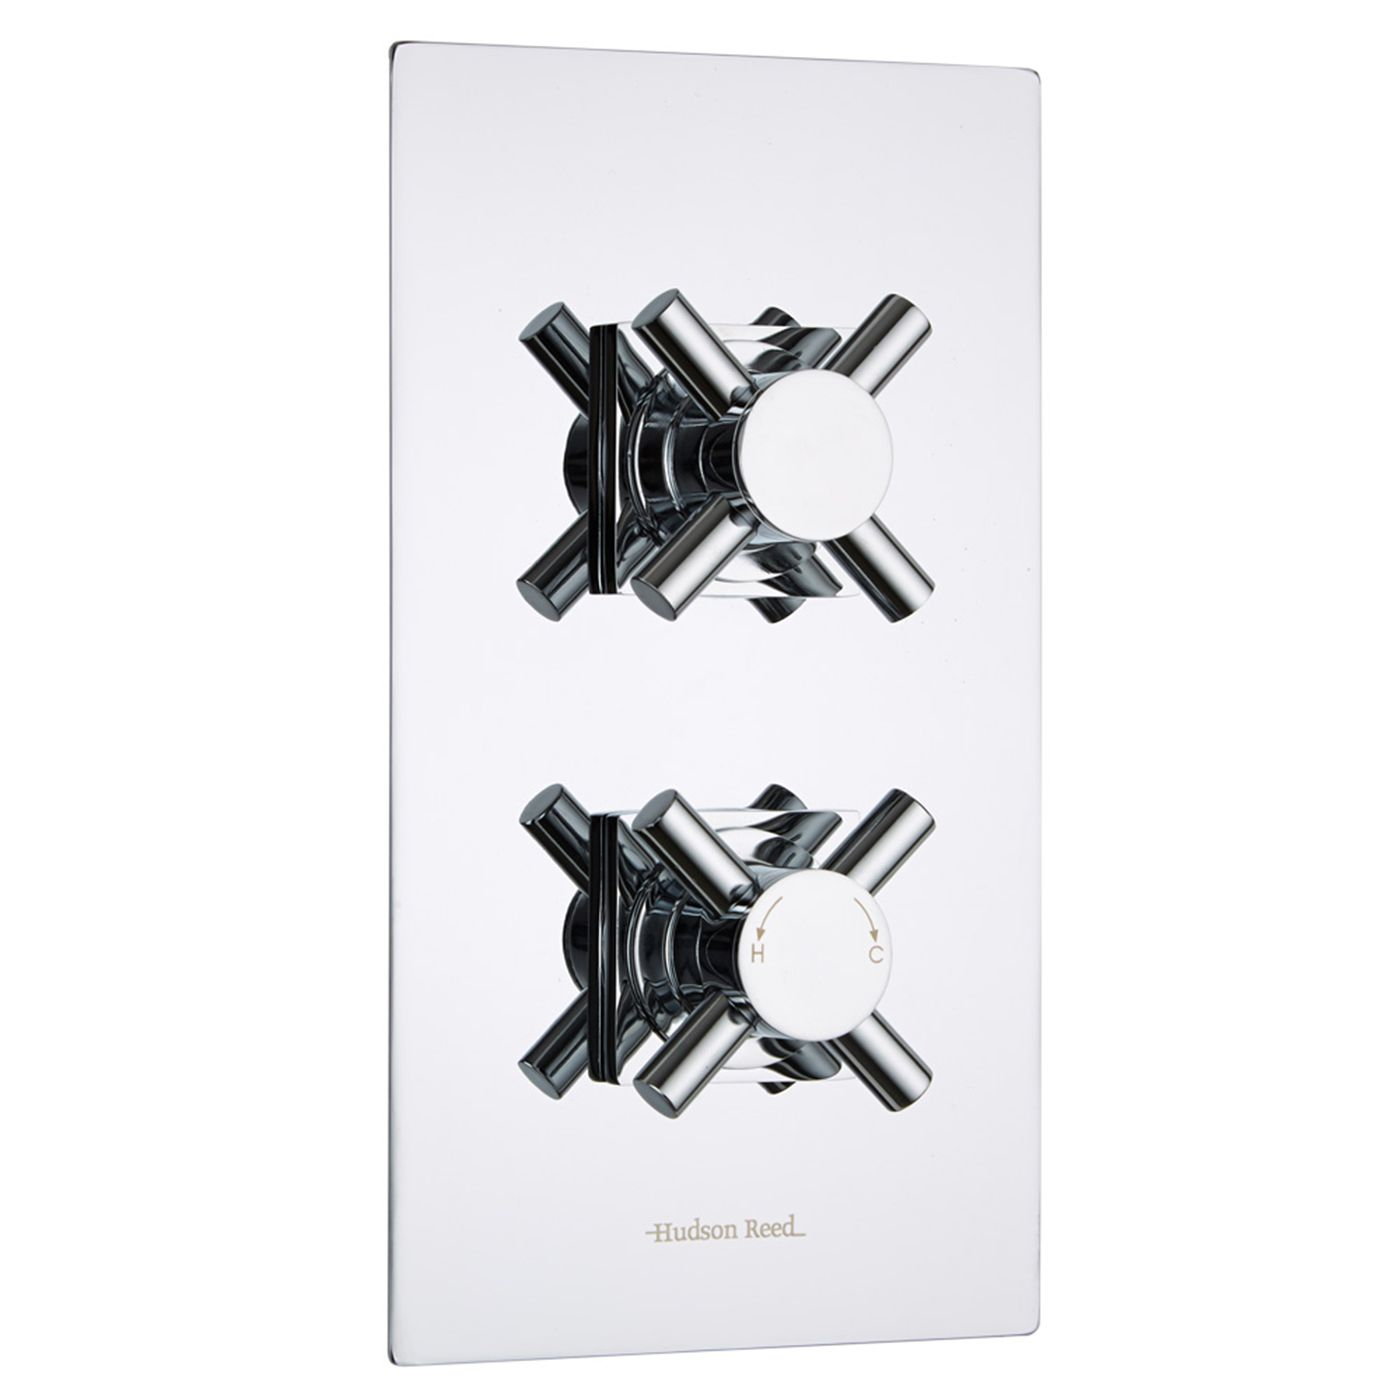 Kristal Concealed 1 Outlet Twin Thermostatic Shower Valve (Square Flange)